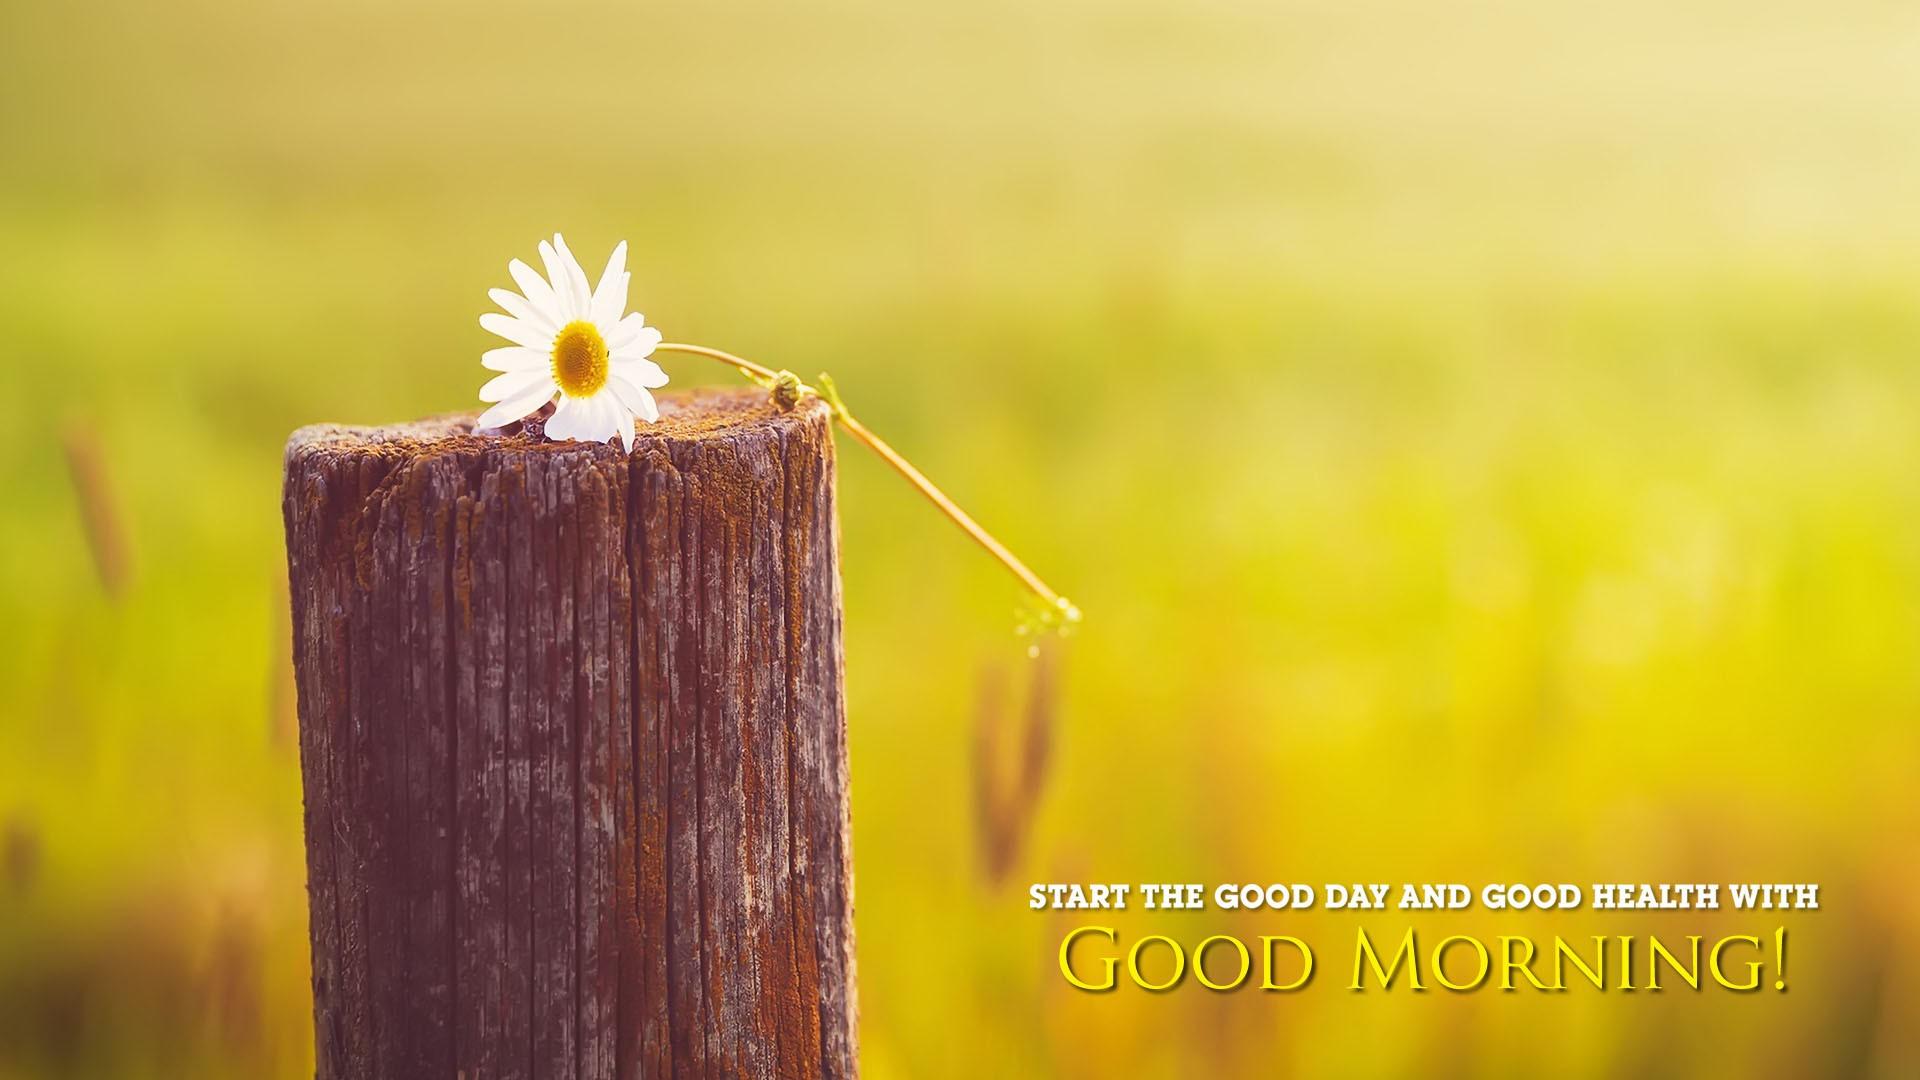 Good Morning Flower Thought Wallpapers New Hd Wallpapers Good Morning Best Wishes 1920x1080 Download Hd Wallpaper Wallpapertip